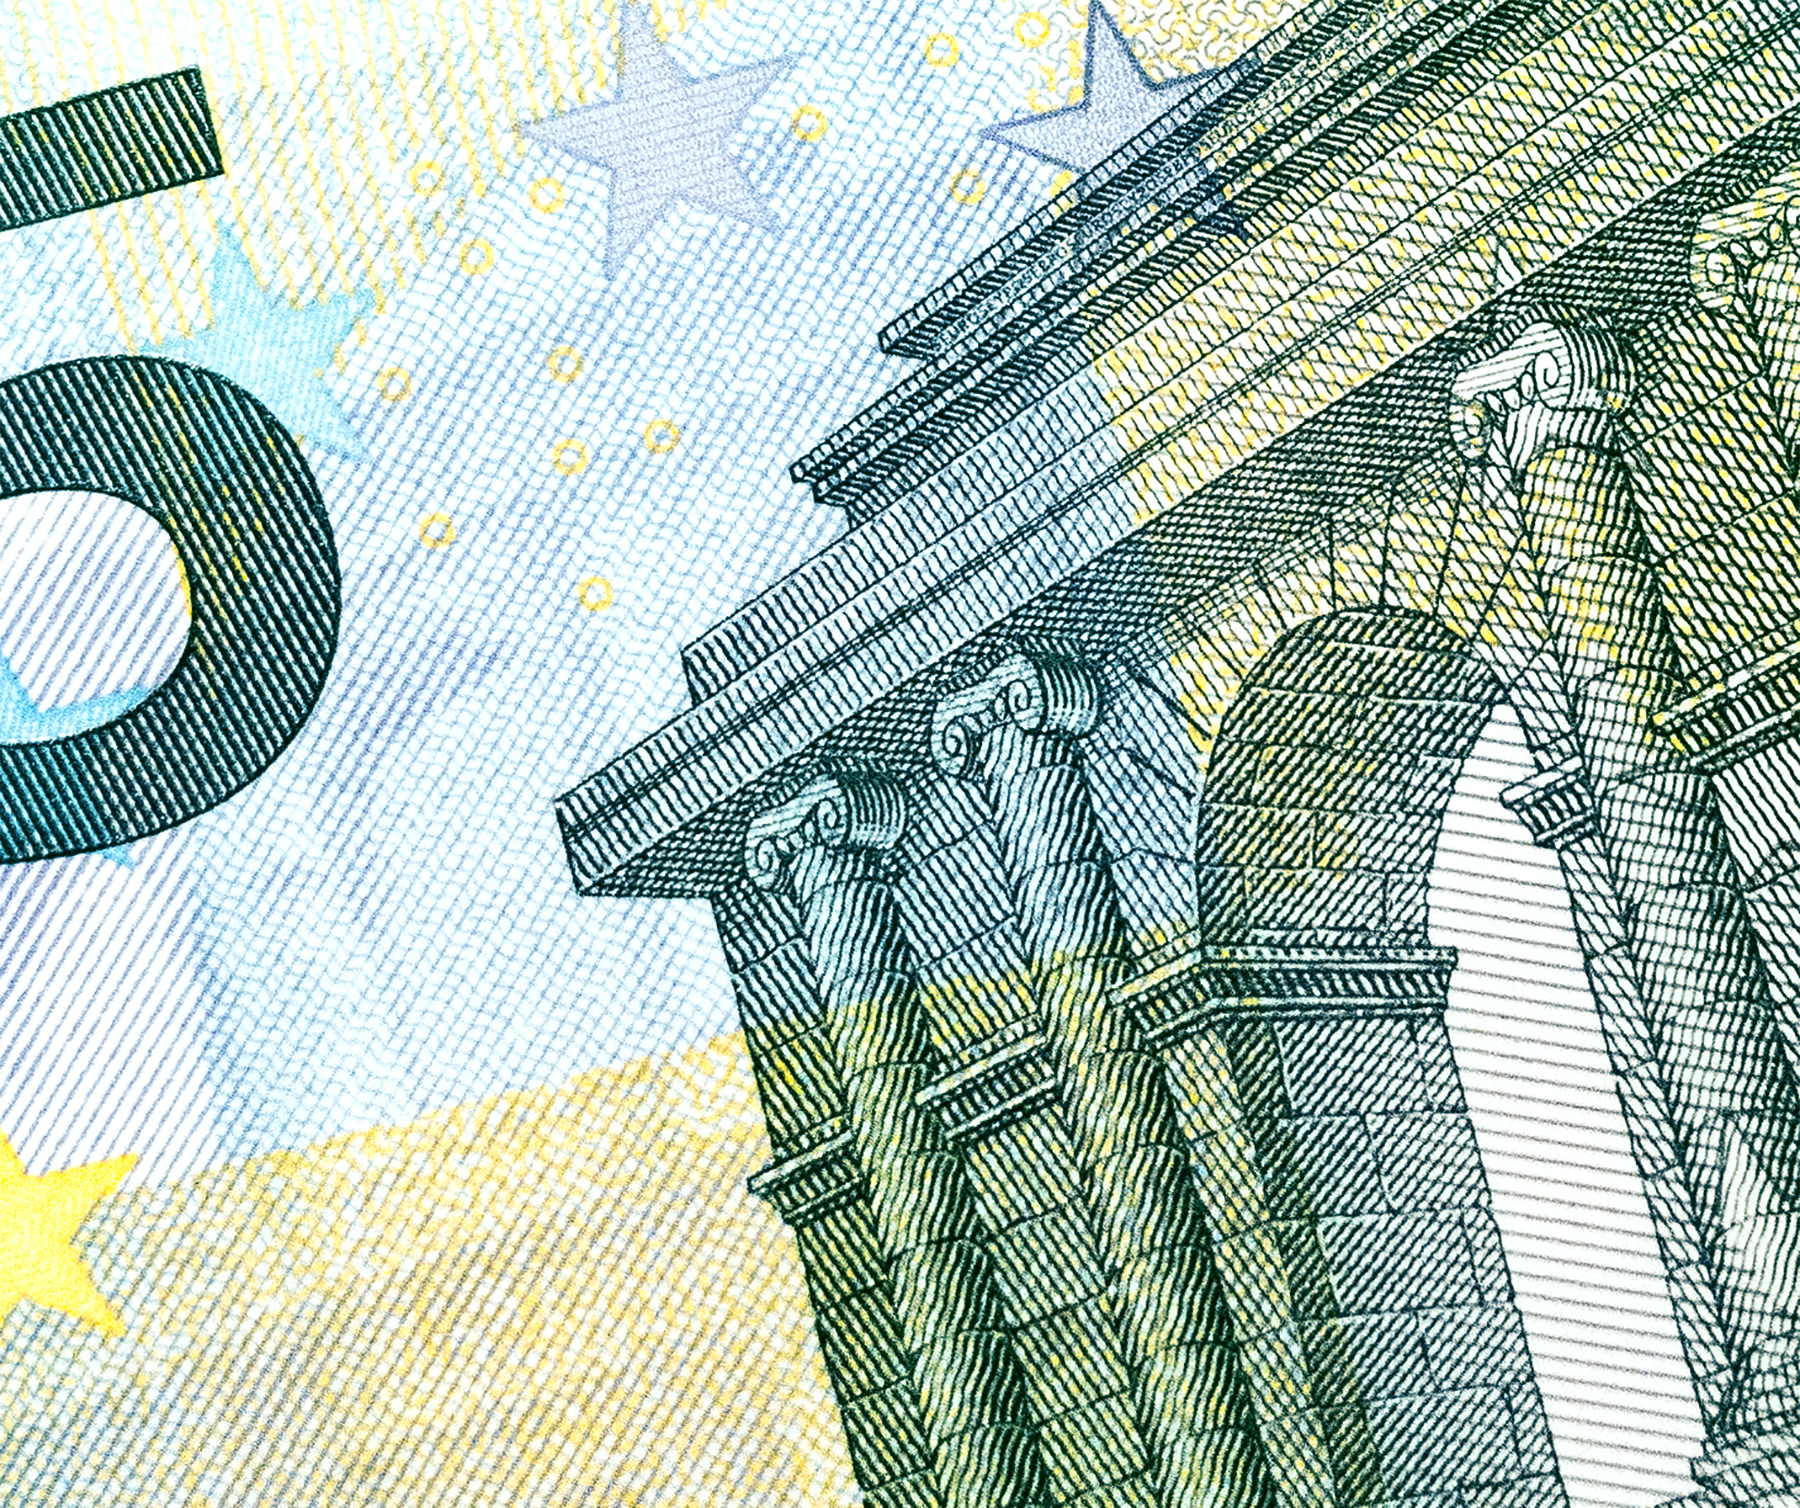 Five euro note close-up